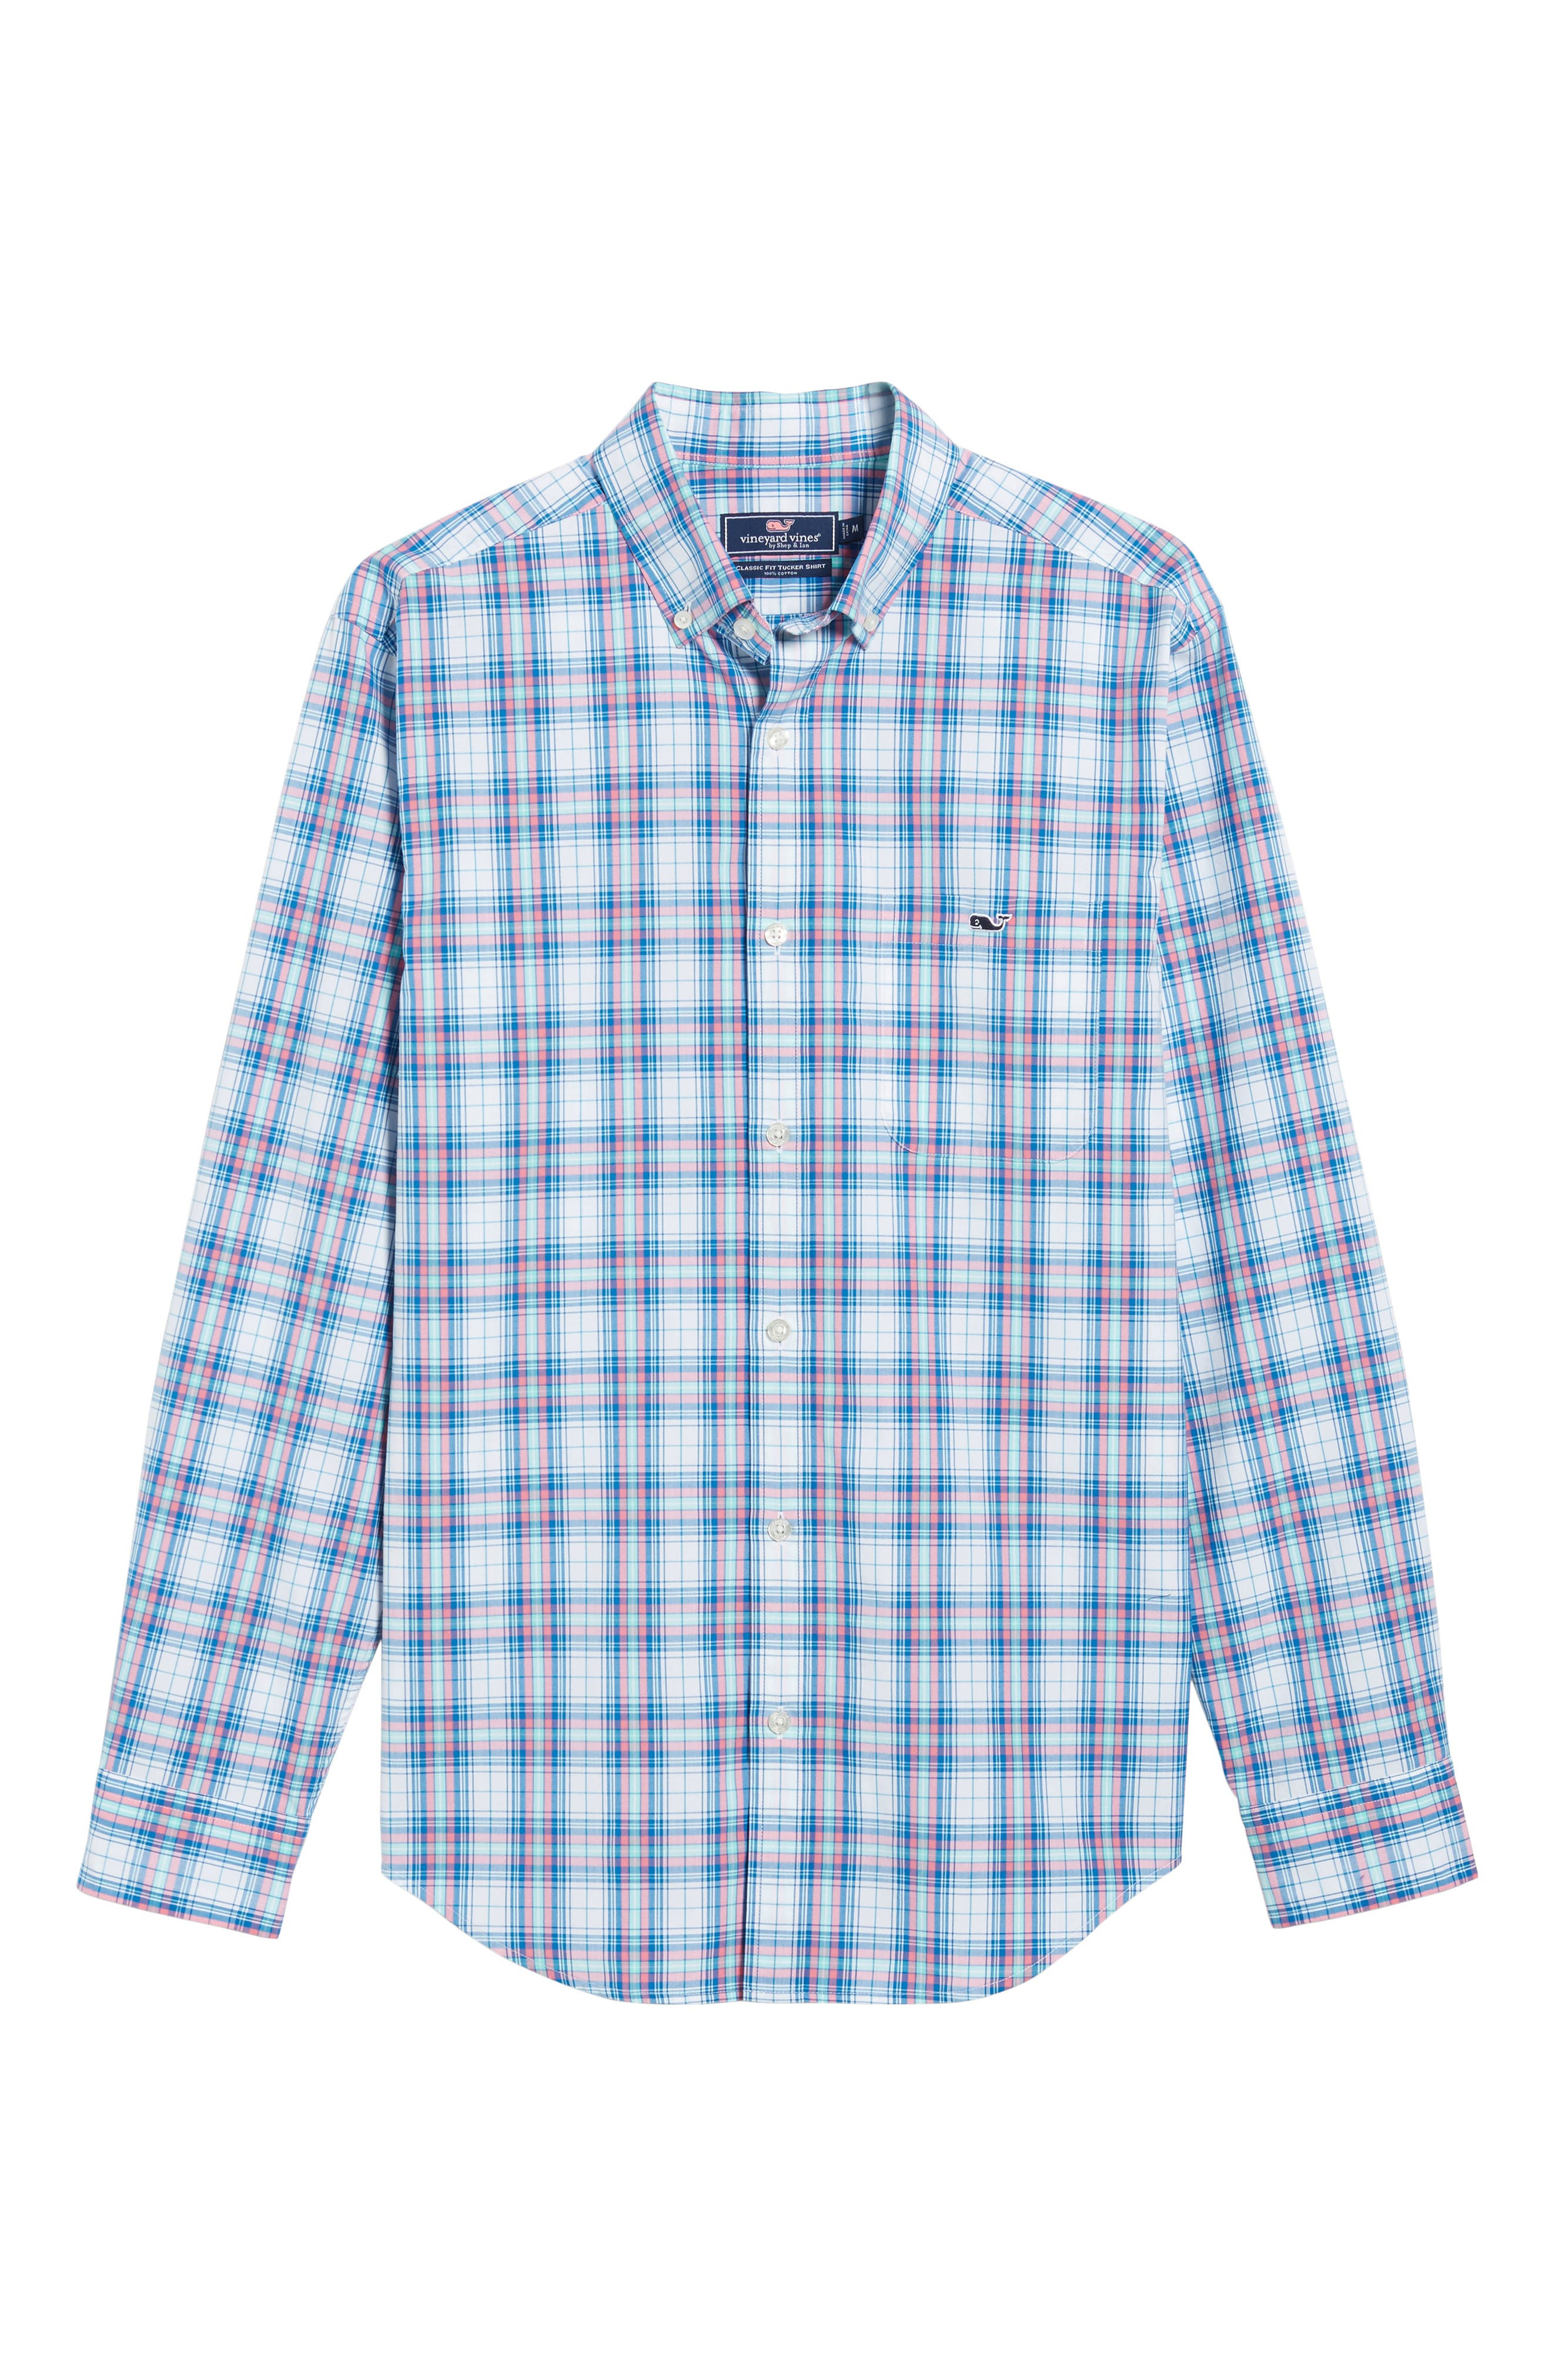 Tucker Sunset Pines Classic Fit Plaid Sport Shirt,                             Alternate thumbnail 6, color,                             650